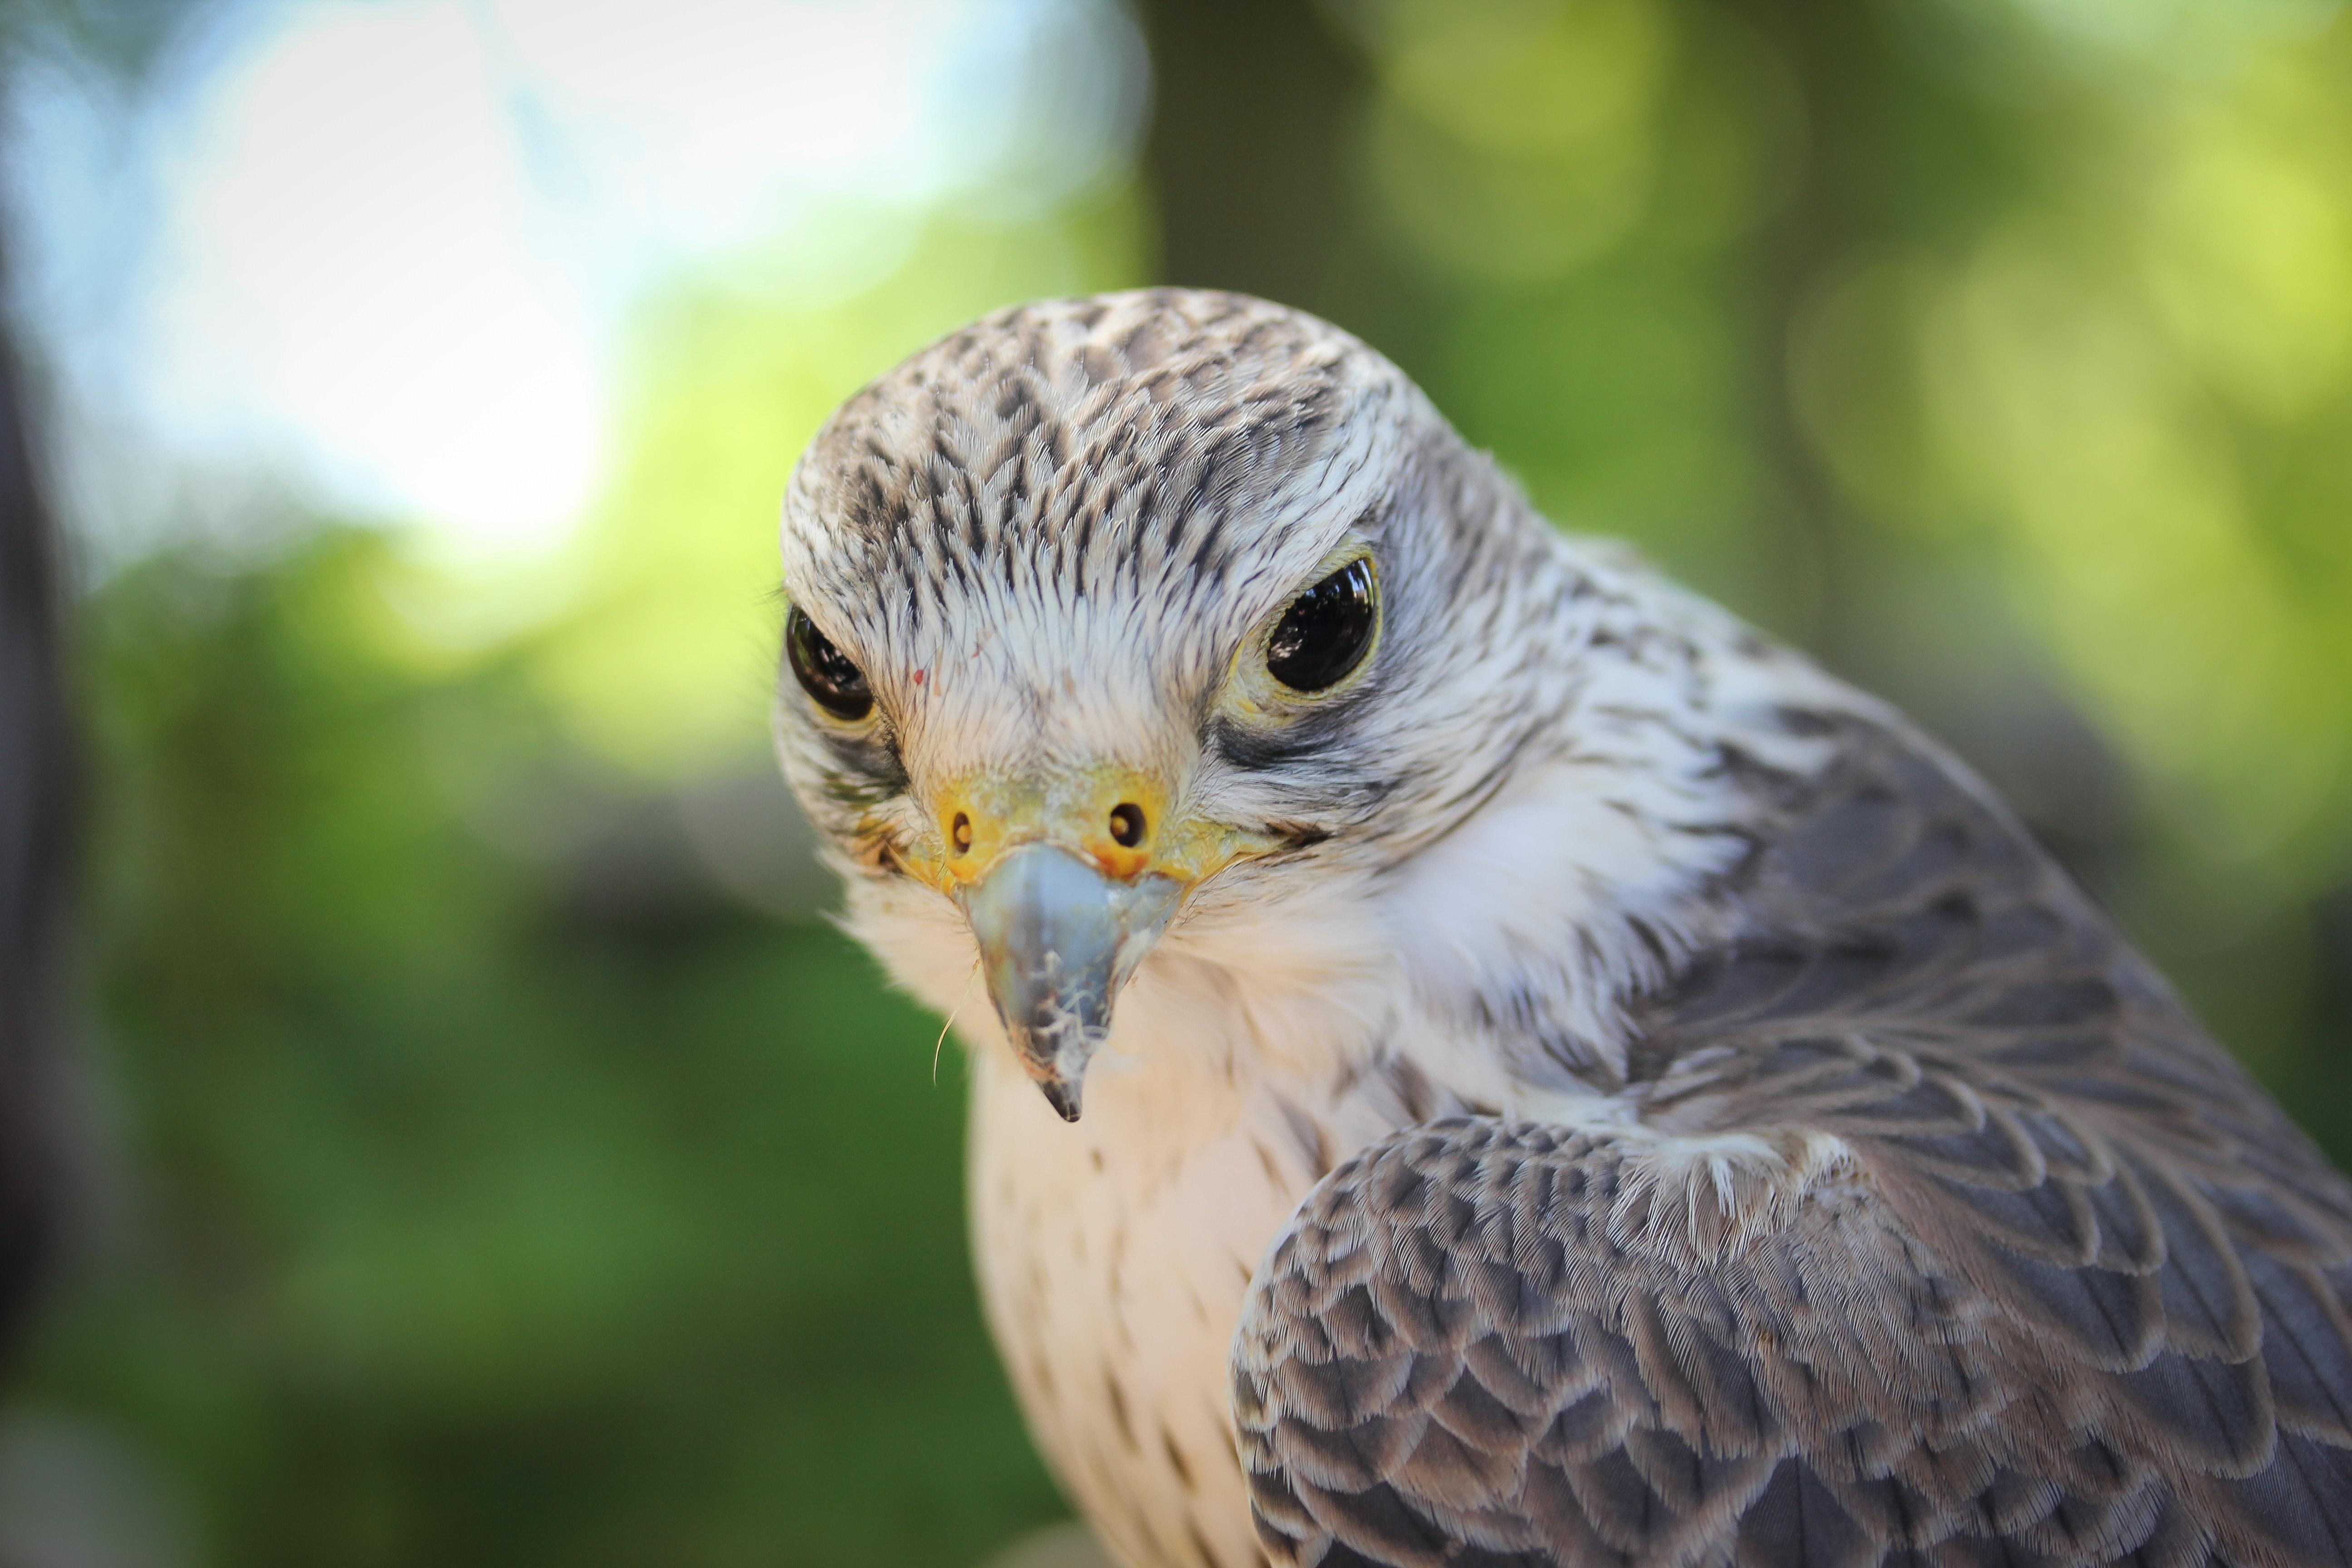 selective focus photography of gray short-beaked bird